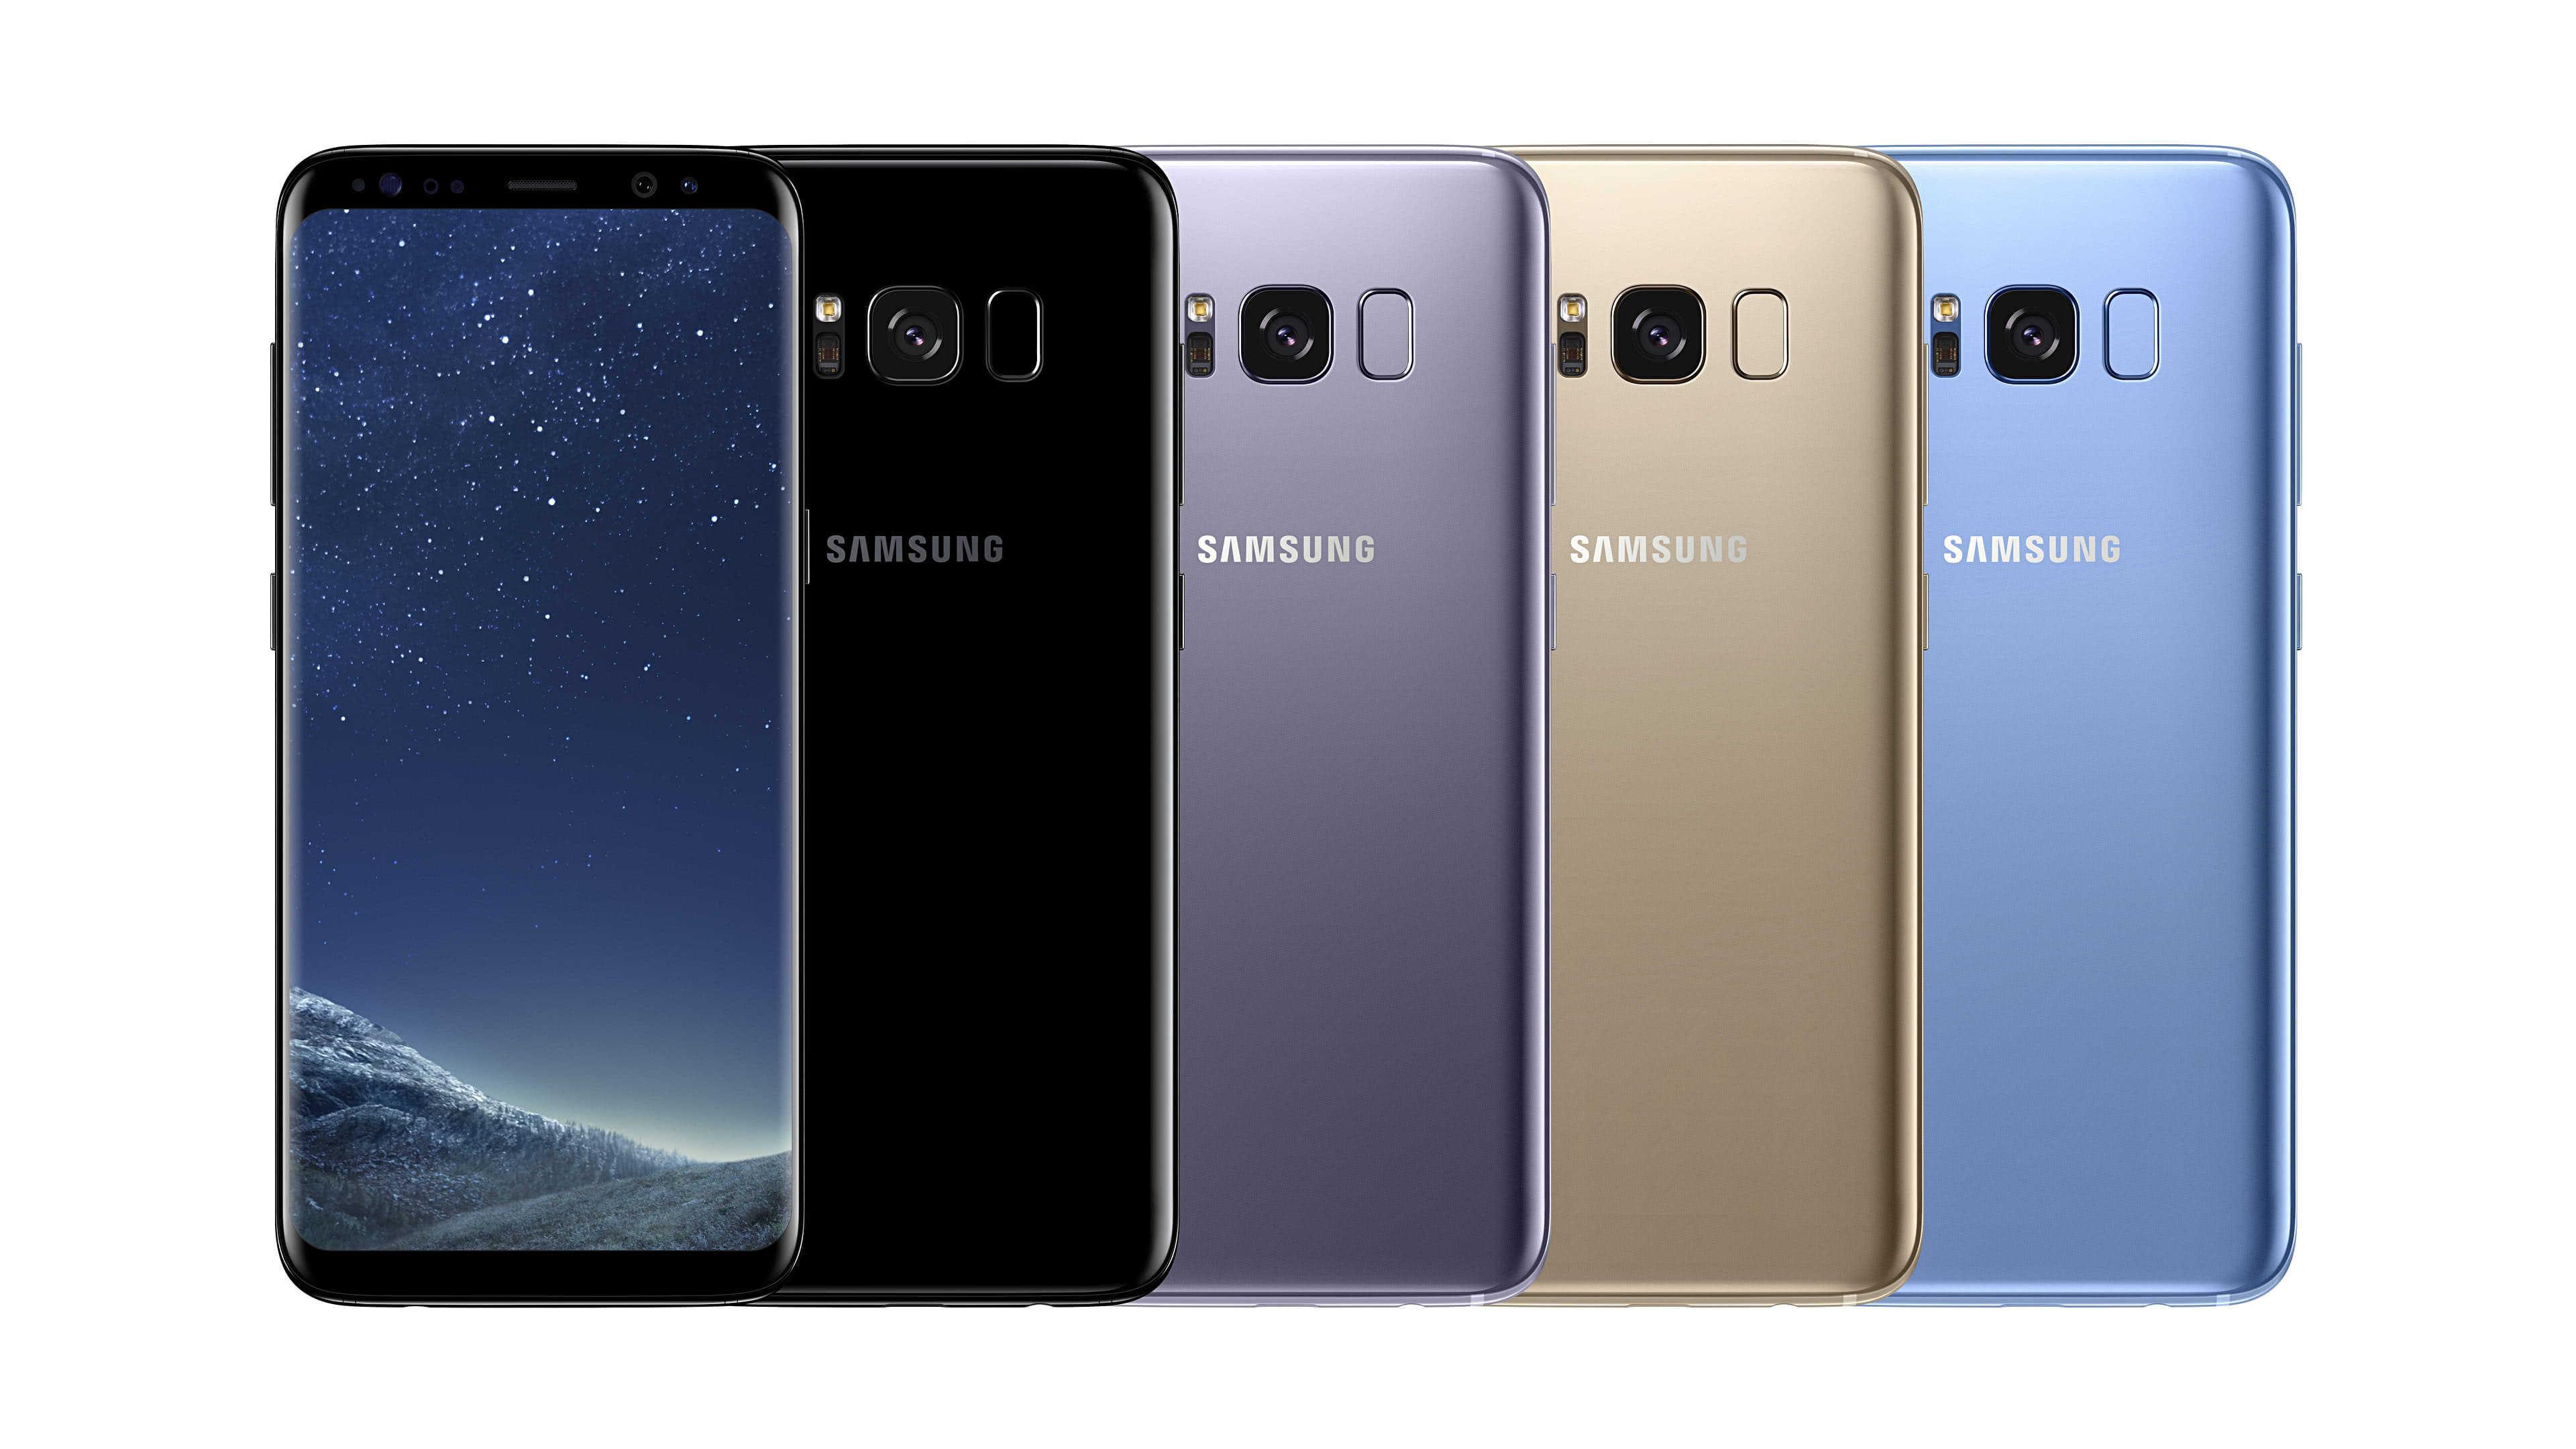 samsung galaxy 8 colors uhd 4k wallpaper